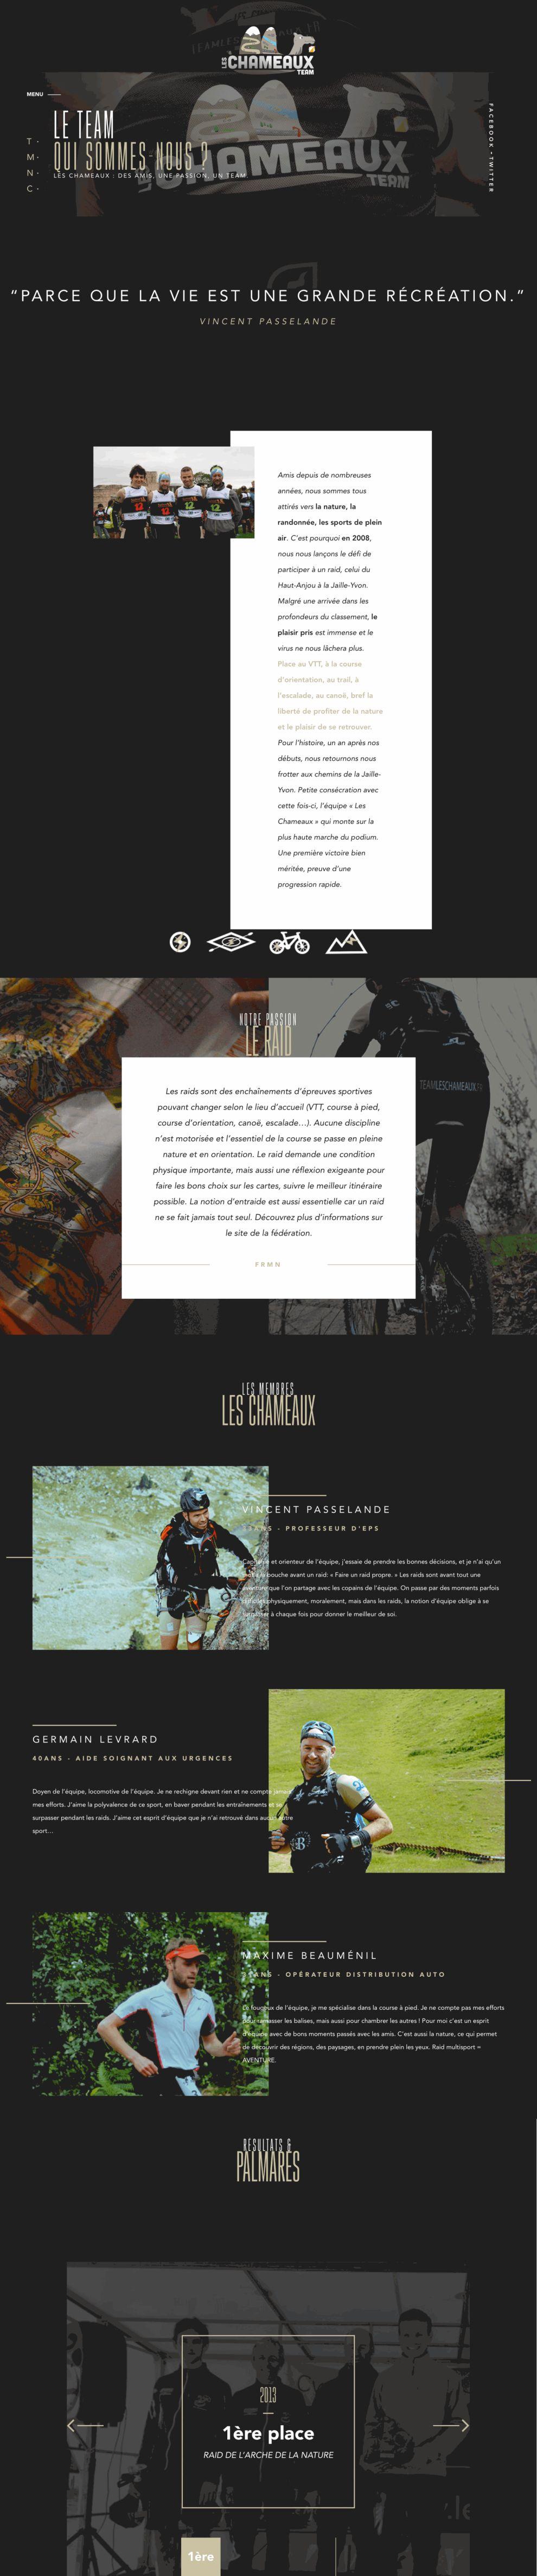 Team Les Chameaux Beautiful About Page